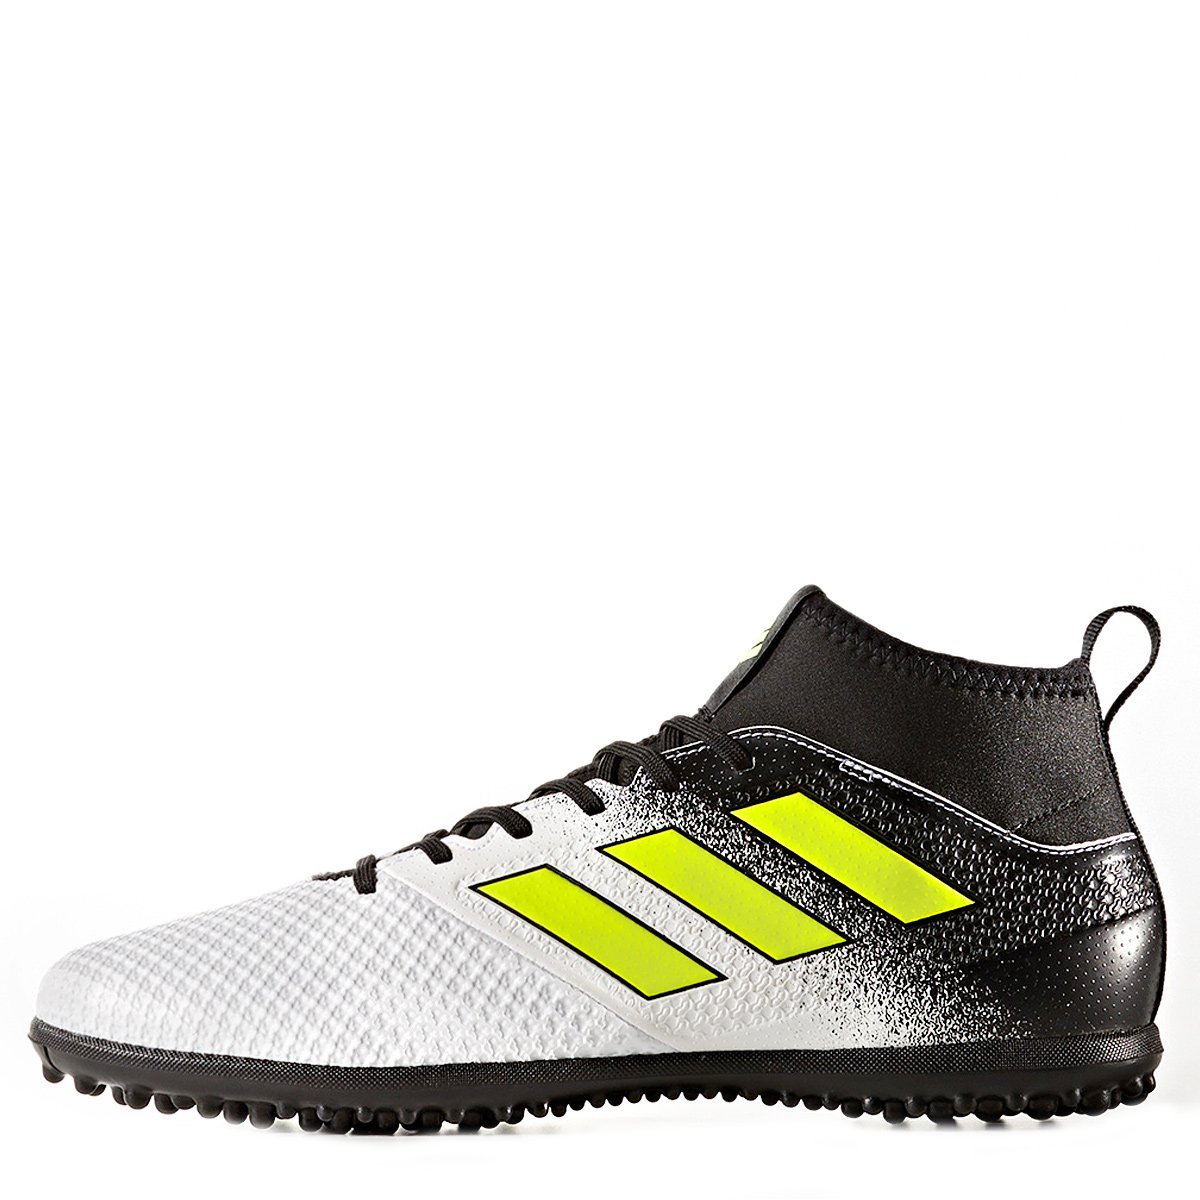 Chuteira Society Adidas Ace 17.3 TF - Branco - Compre Agora  76f8f3d6fe43d